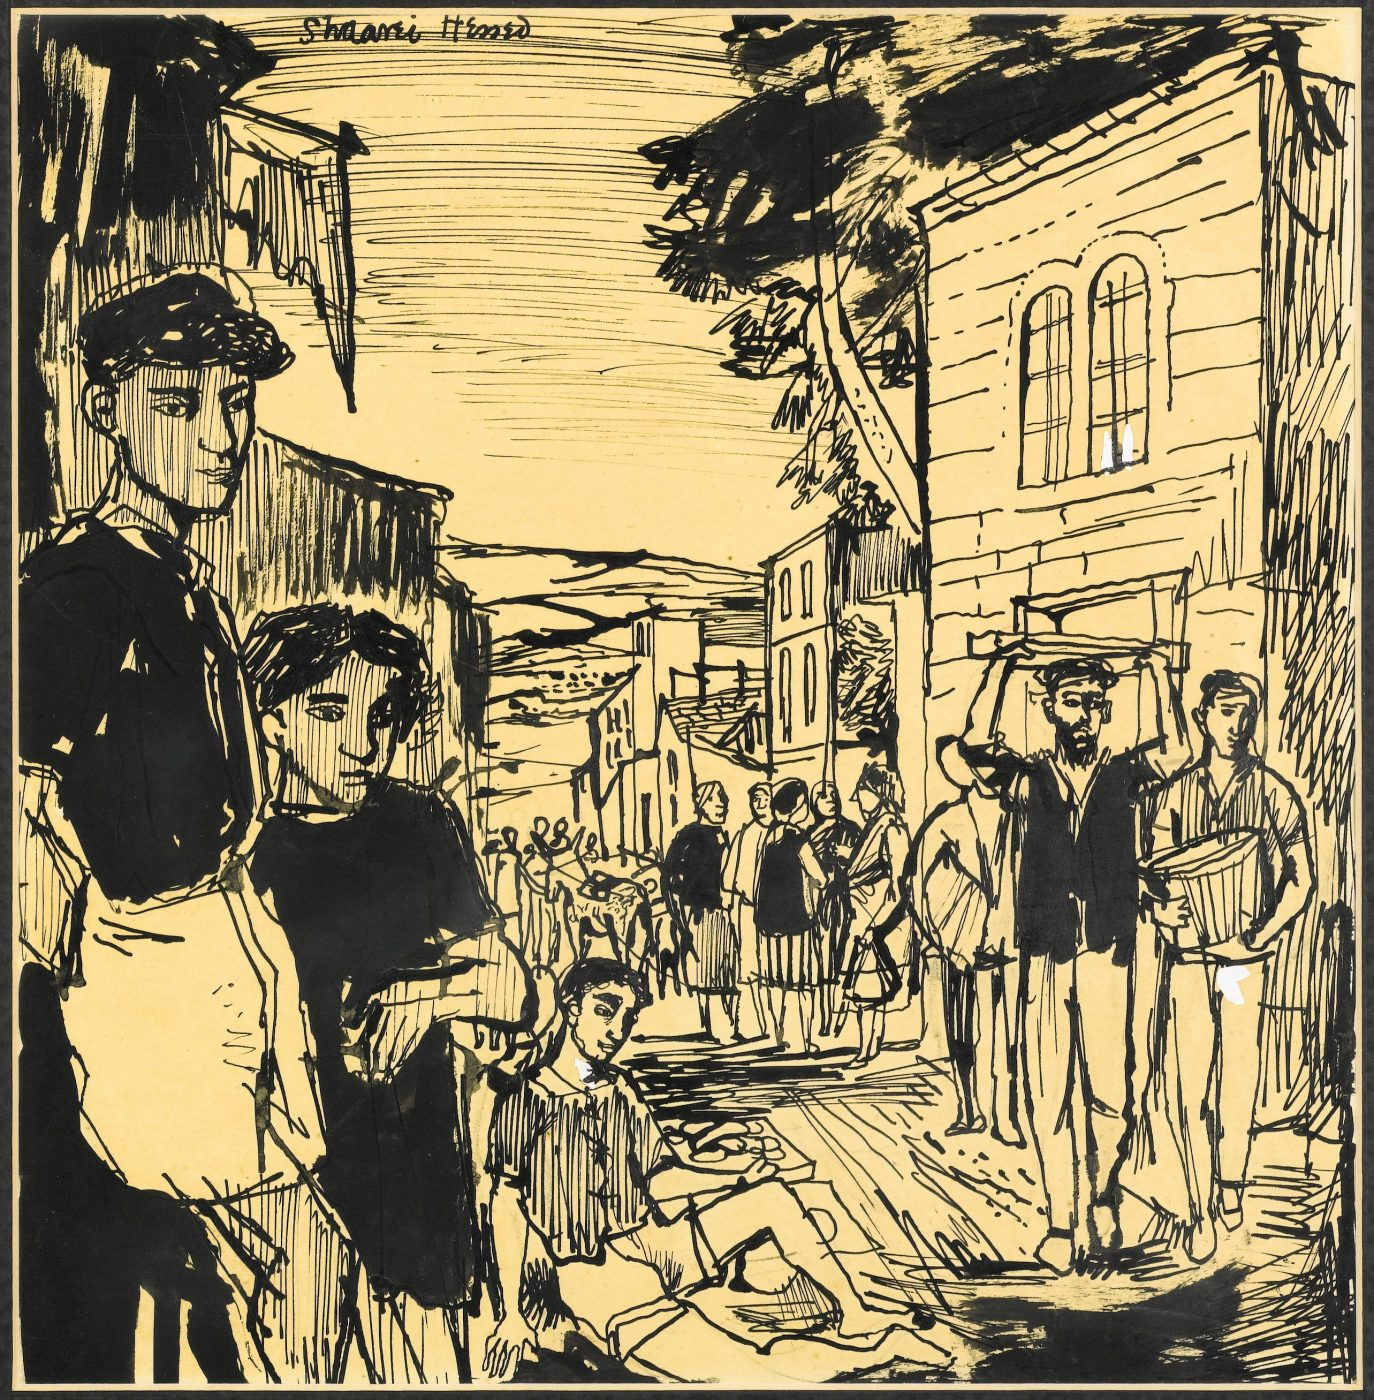 John Minton (1917-1957), Sha'arei Hessed, Jerusalem